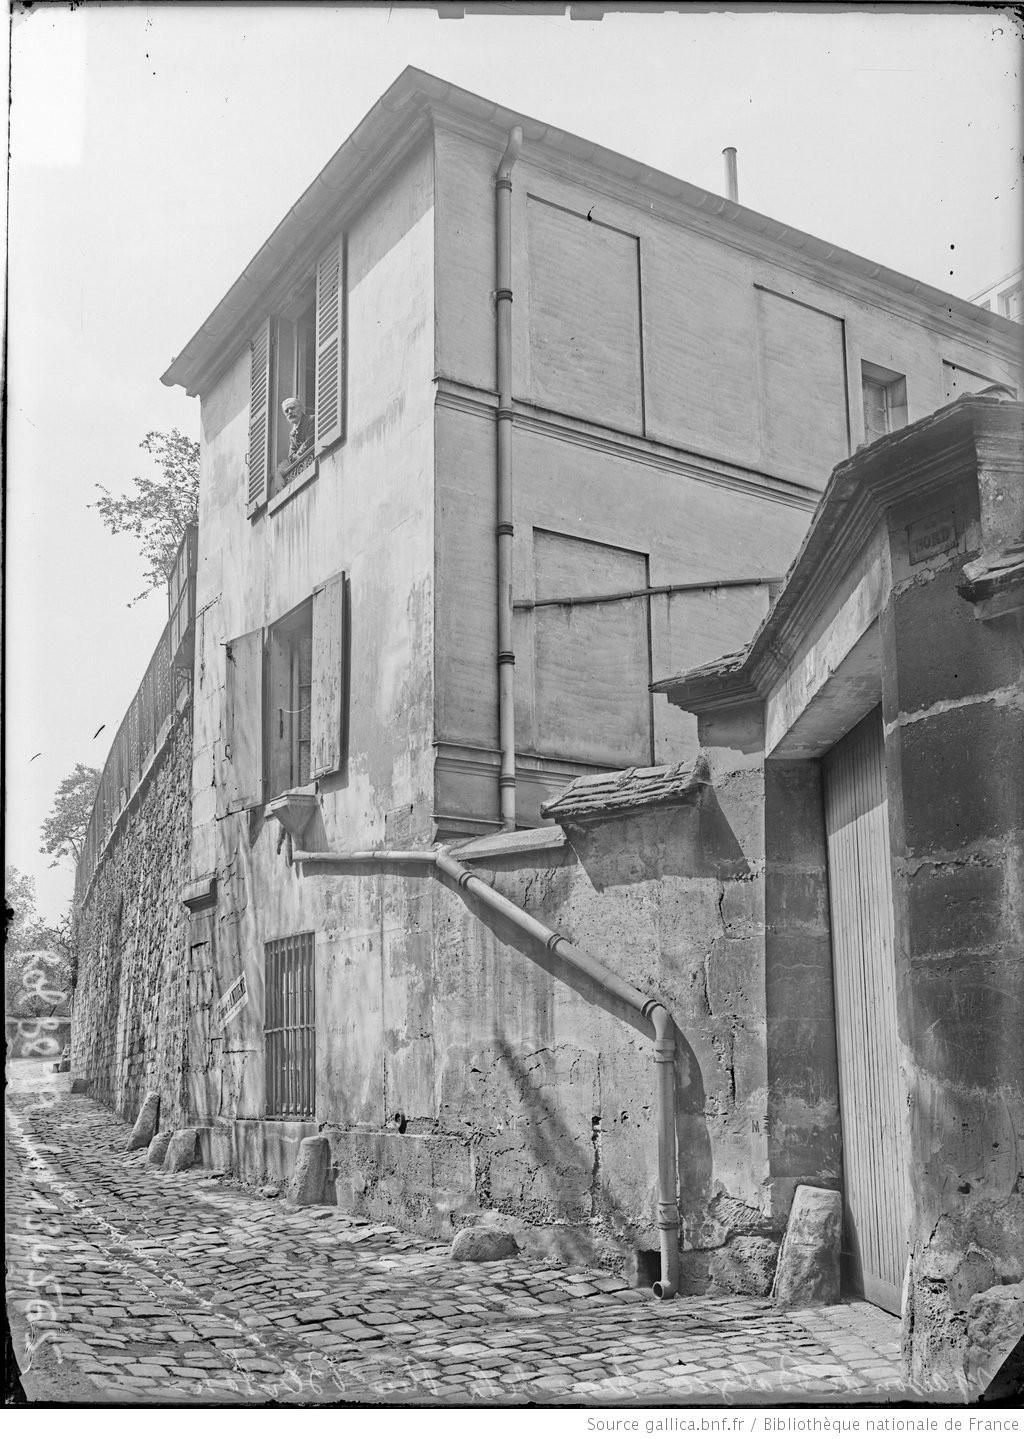 1909,Agence Rol,Maison de Balzac – rue Berton,24, rue Berton,Paris,France